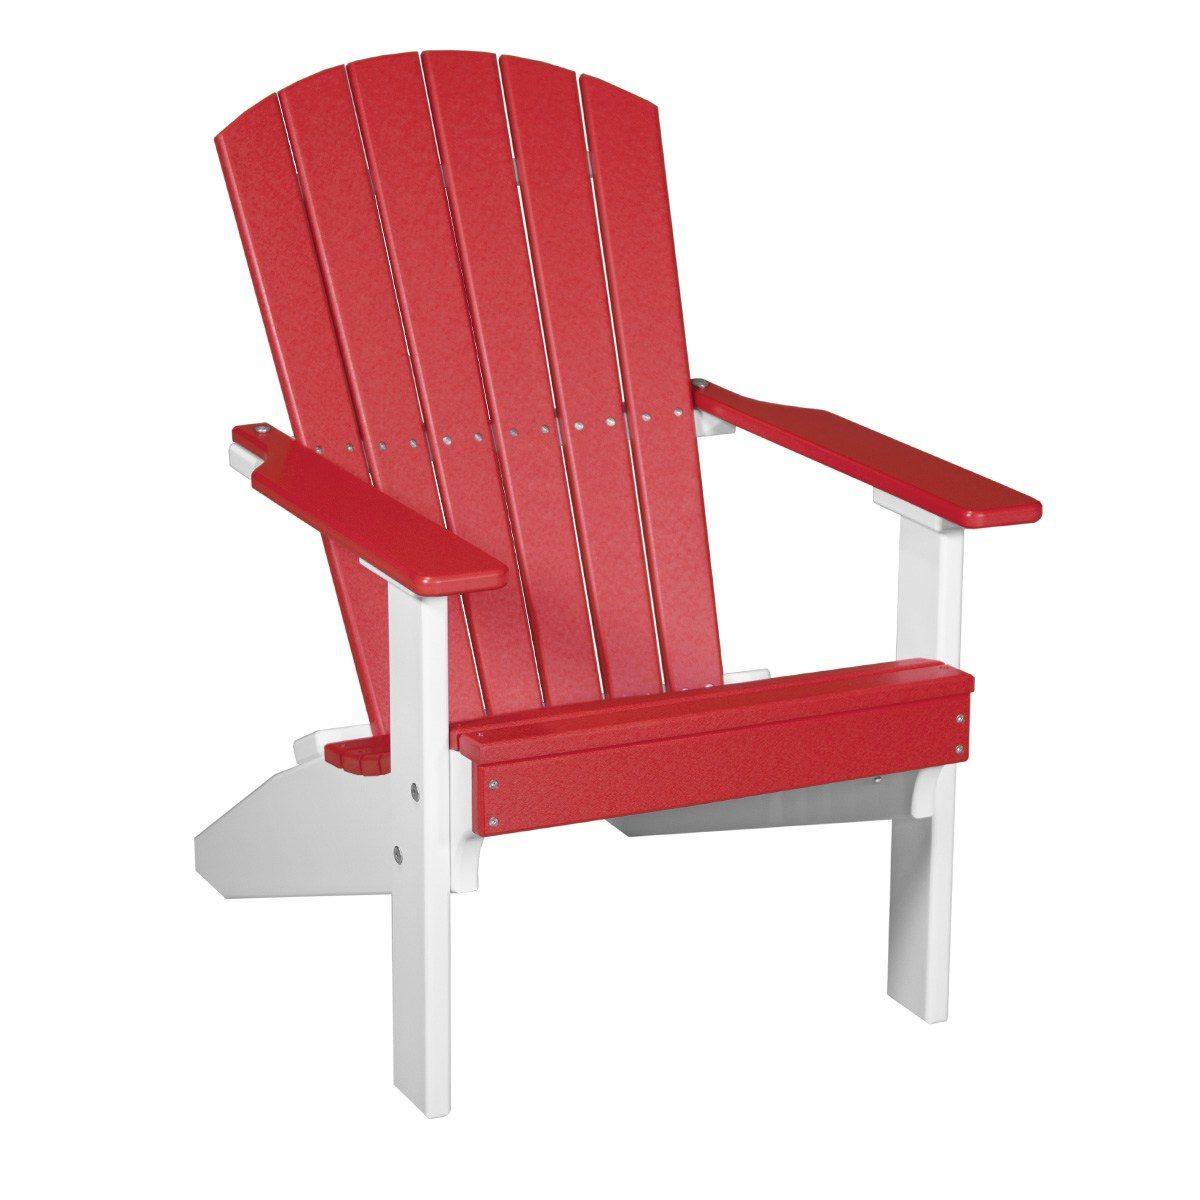 Lakeside Adirondack Chair - Red & White